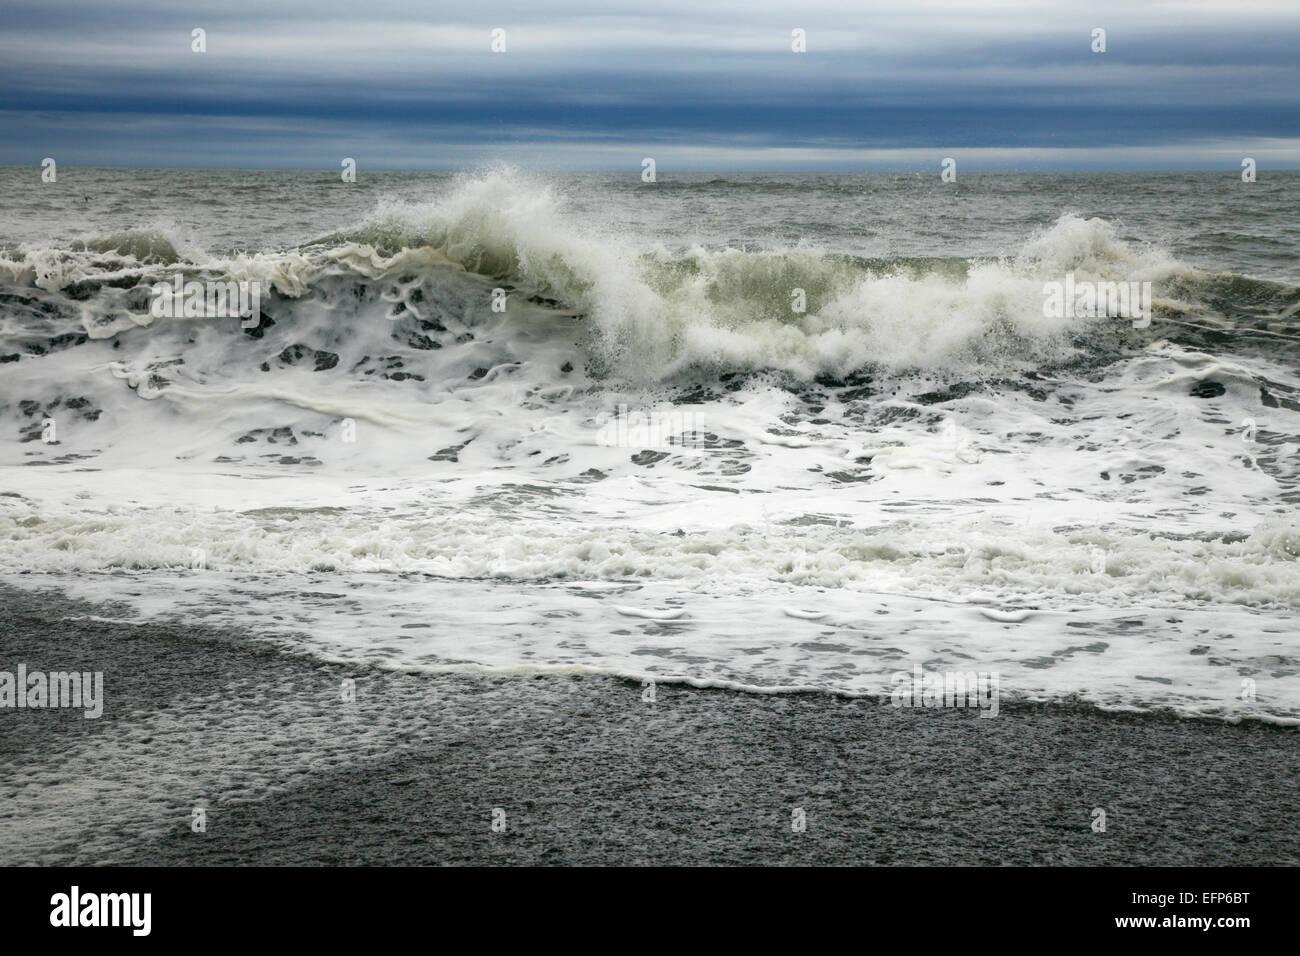 Sea of Okhotsk: the inland sea of Russia or